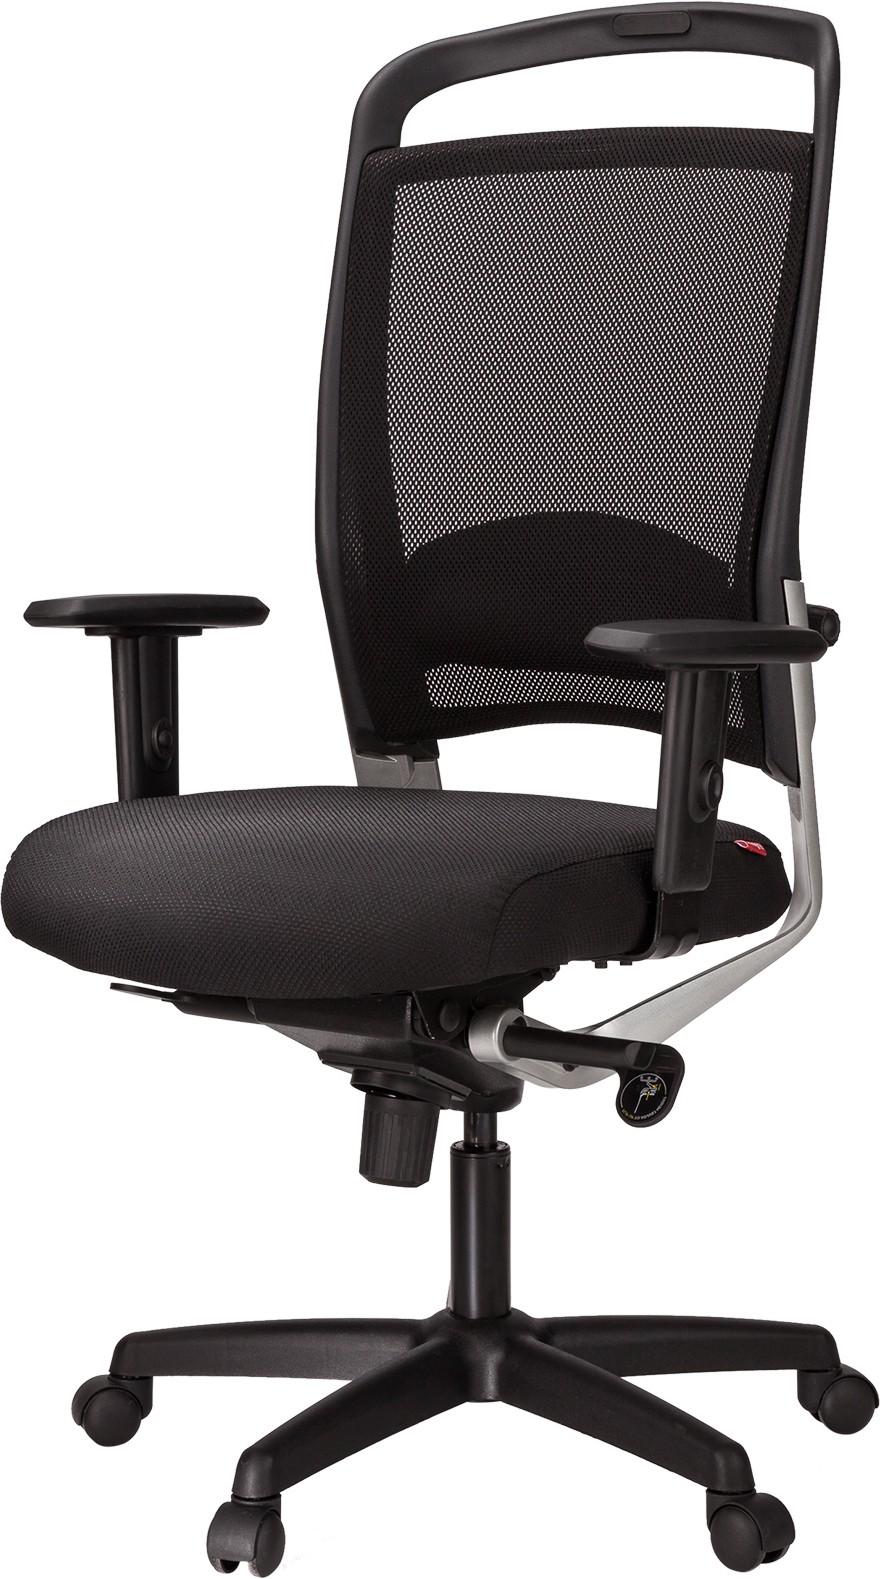 View Ergoline ARIBA MB Plastic Office Chair(Black) Furniture (Ergoline)